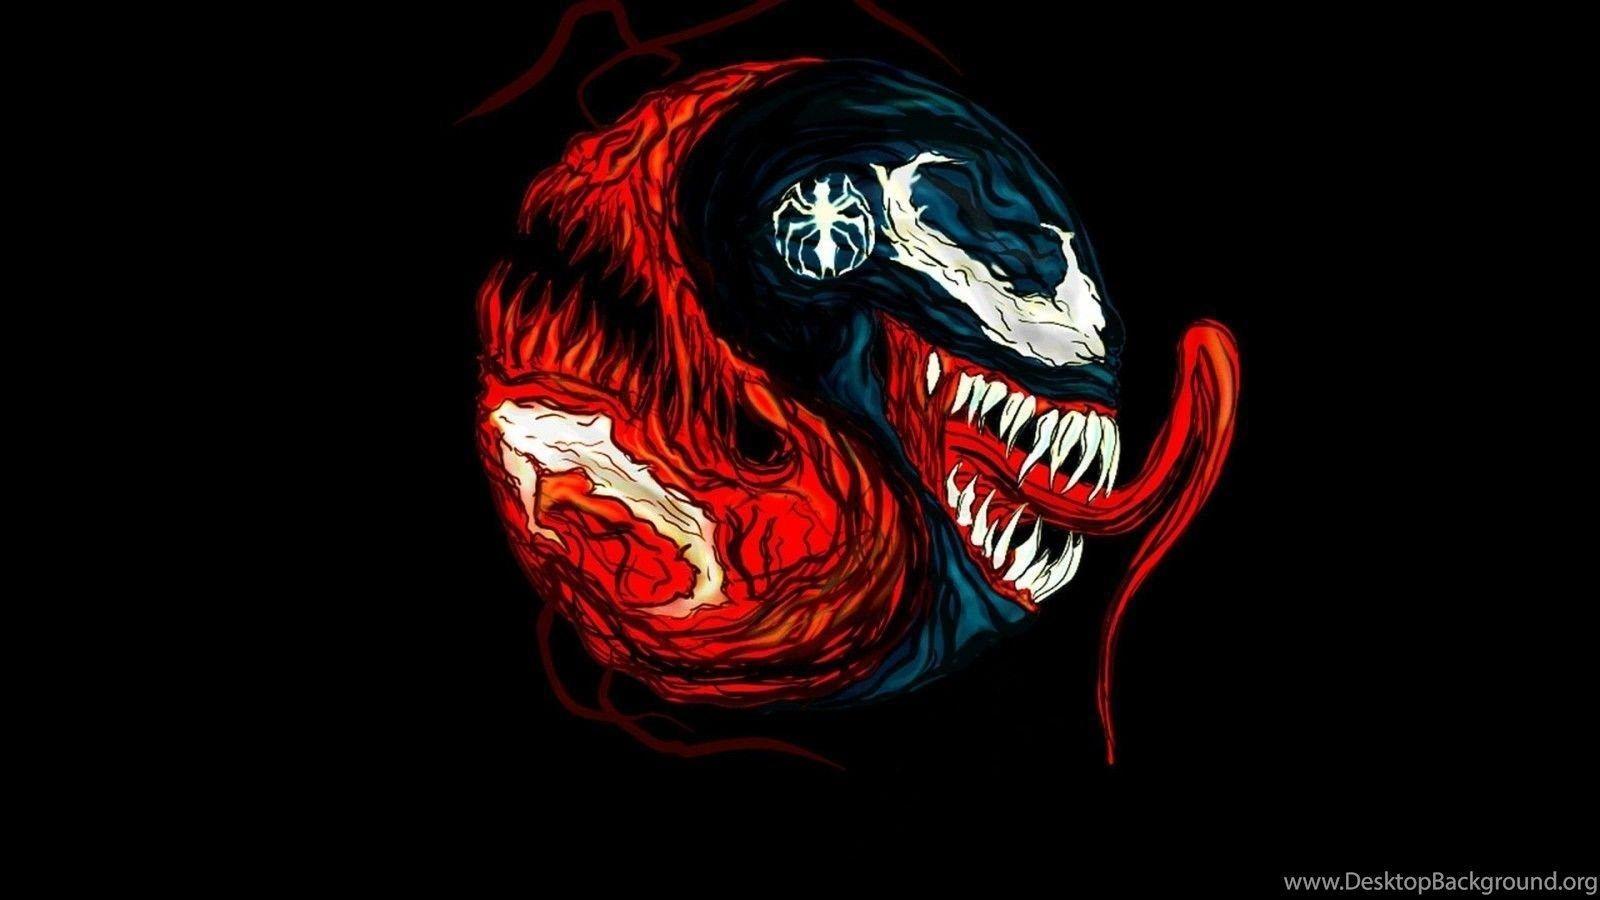 Venom Vs Carnage Wallpapers Top Free Venom Vs Carnage Backgrounds